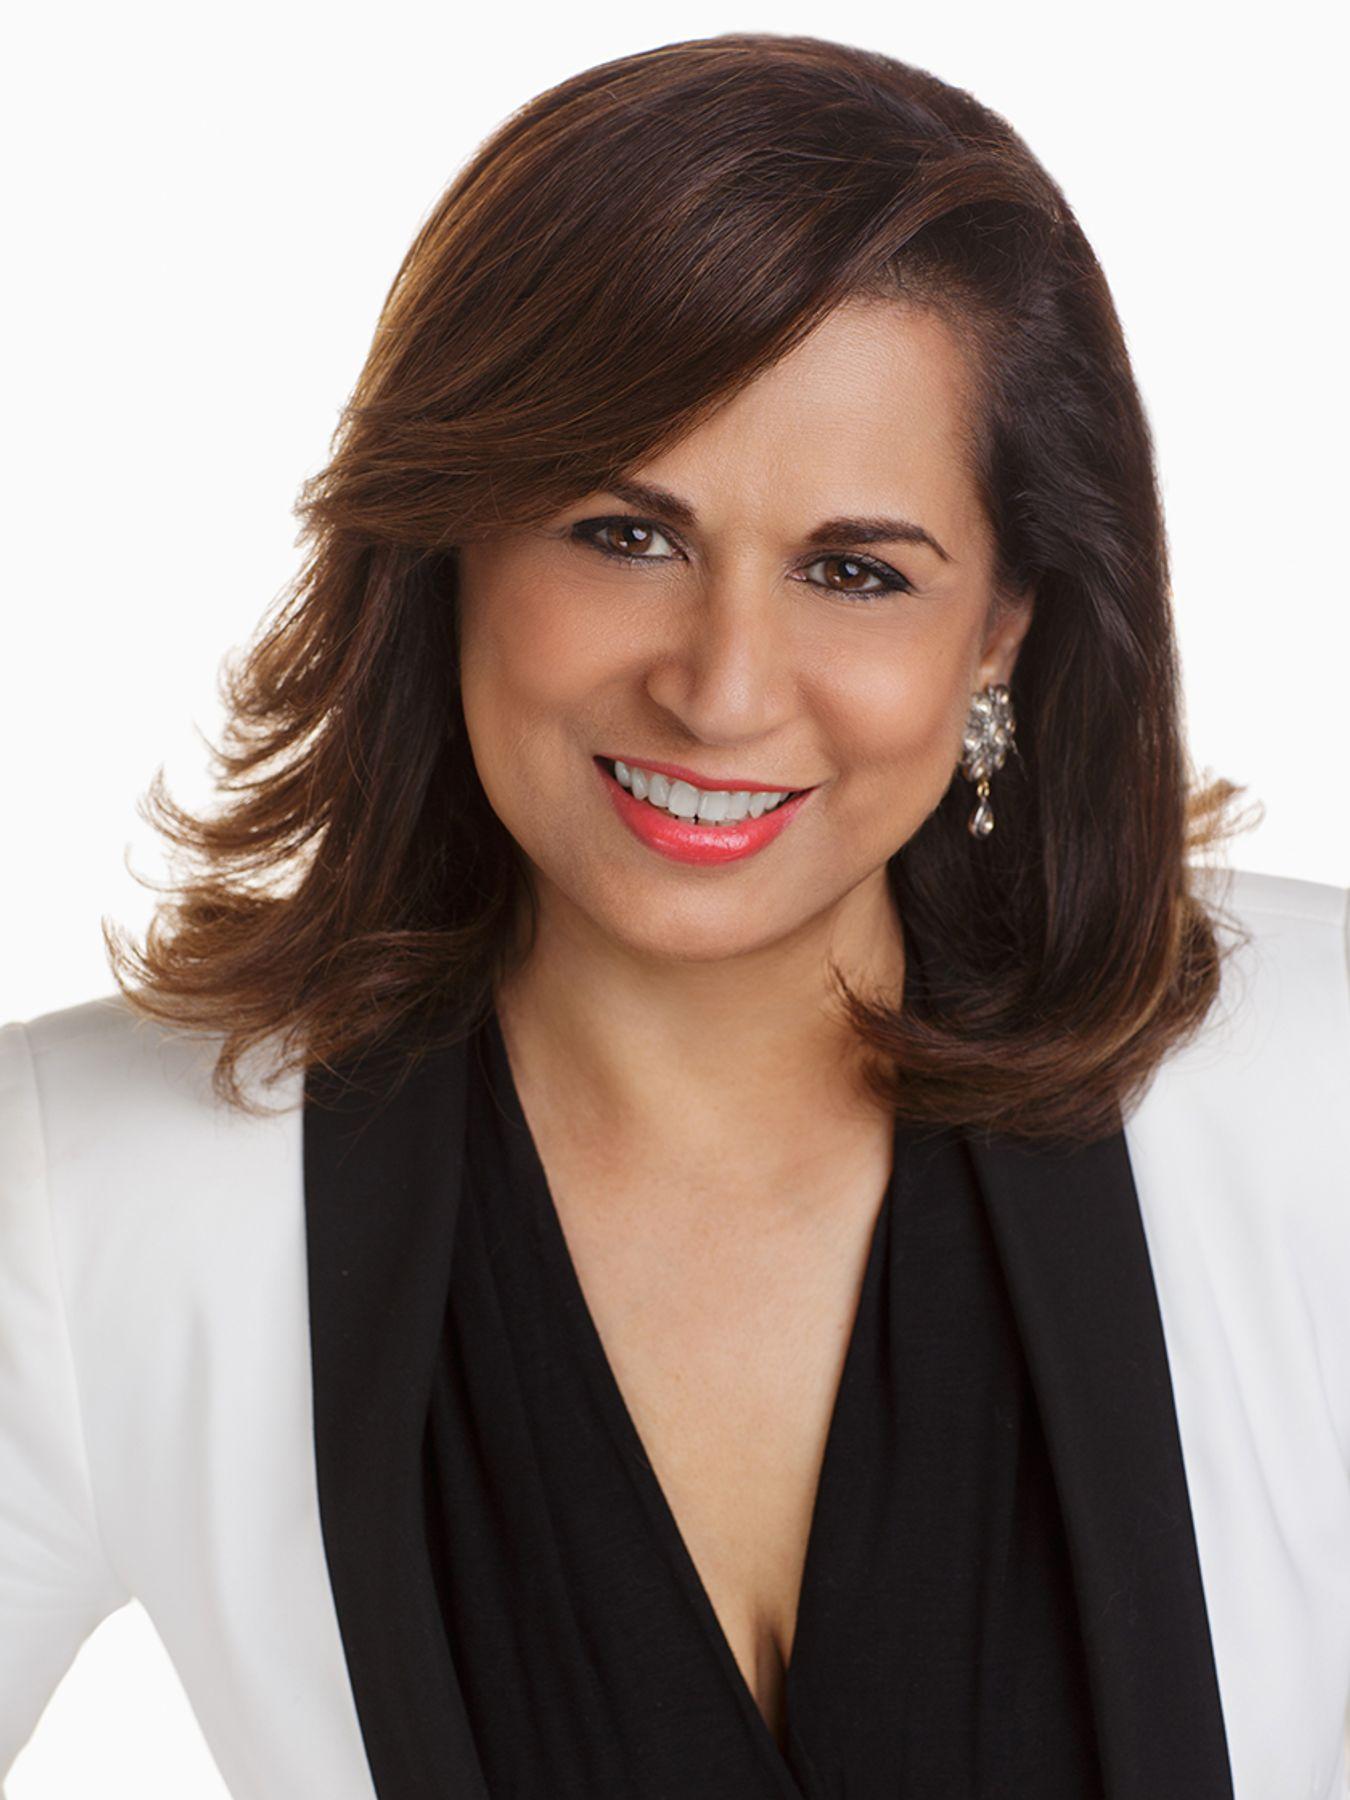 Lena Datwani